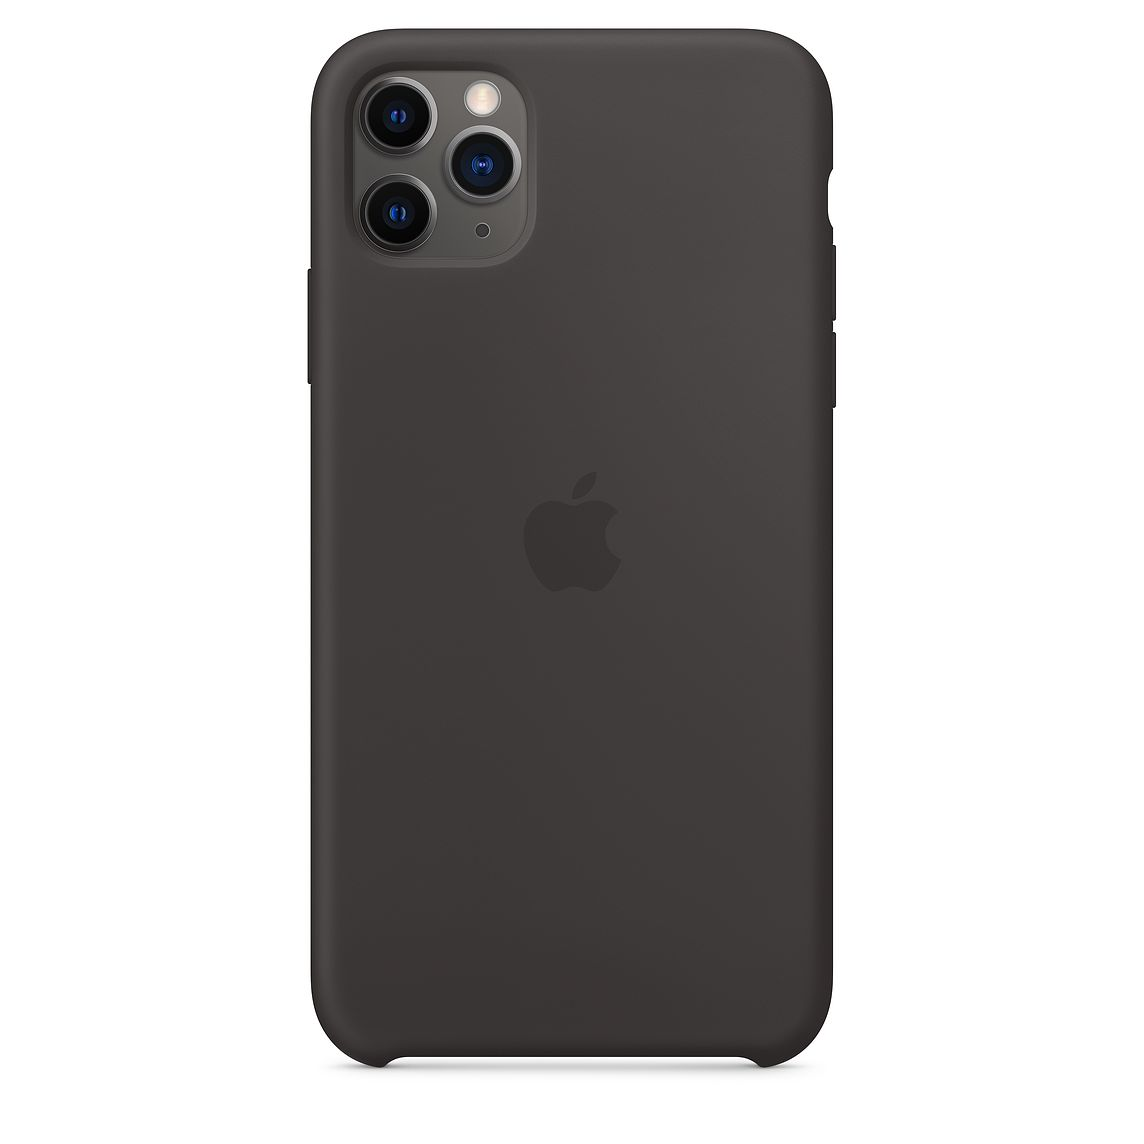 Silicone Case iPhone 11 Pro/ Pro Max Black OEM